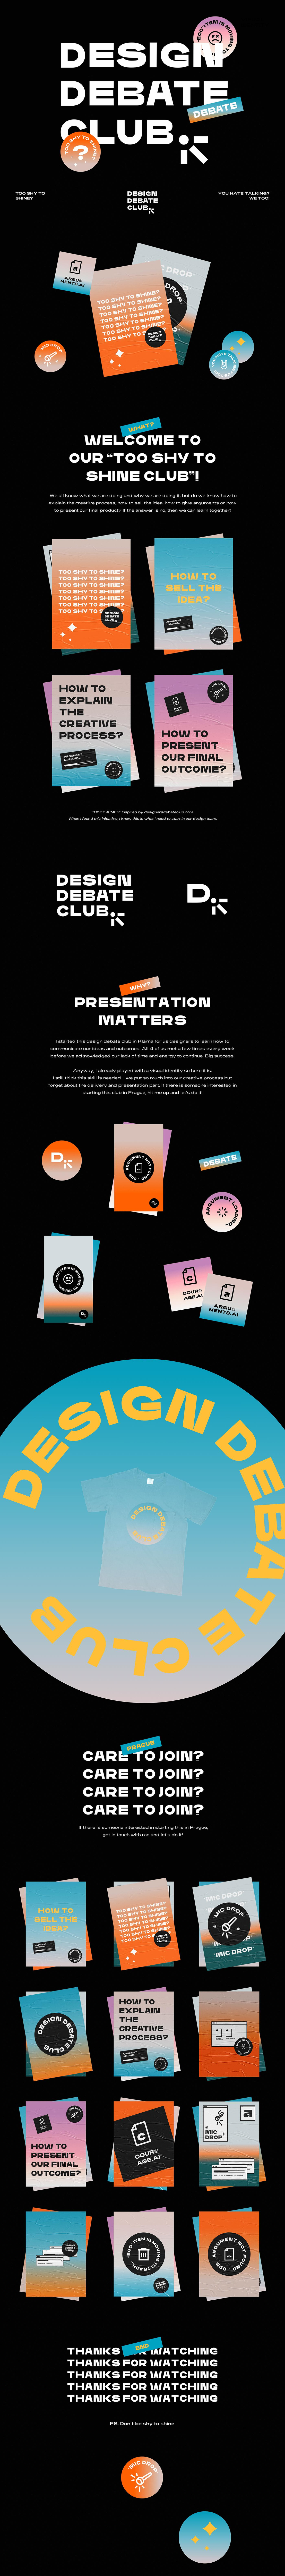 club brand branding  debate debateclub poster stickers designclub visual identity